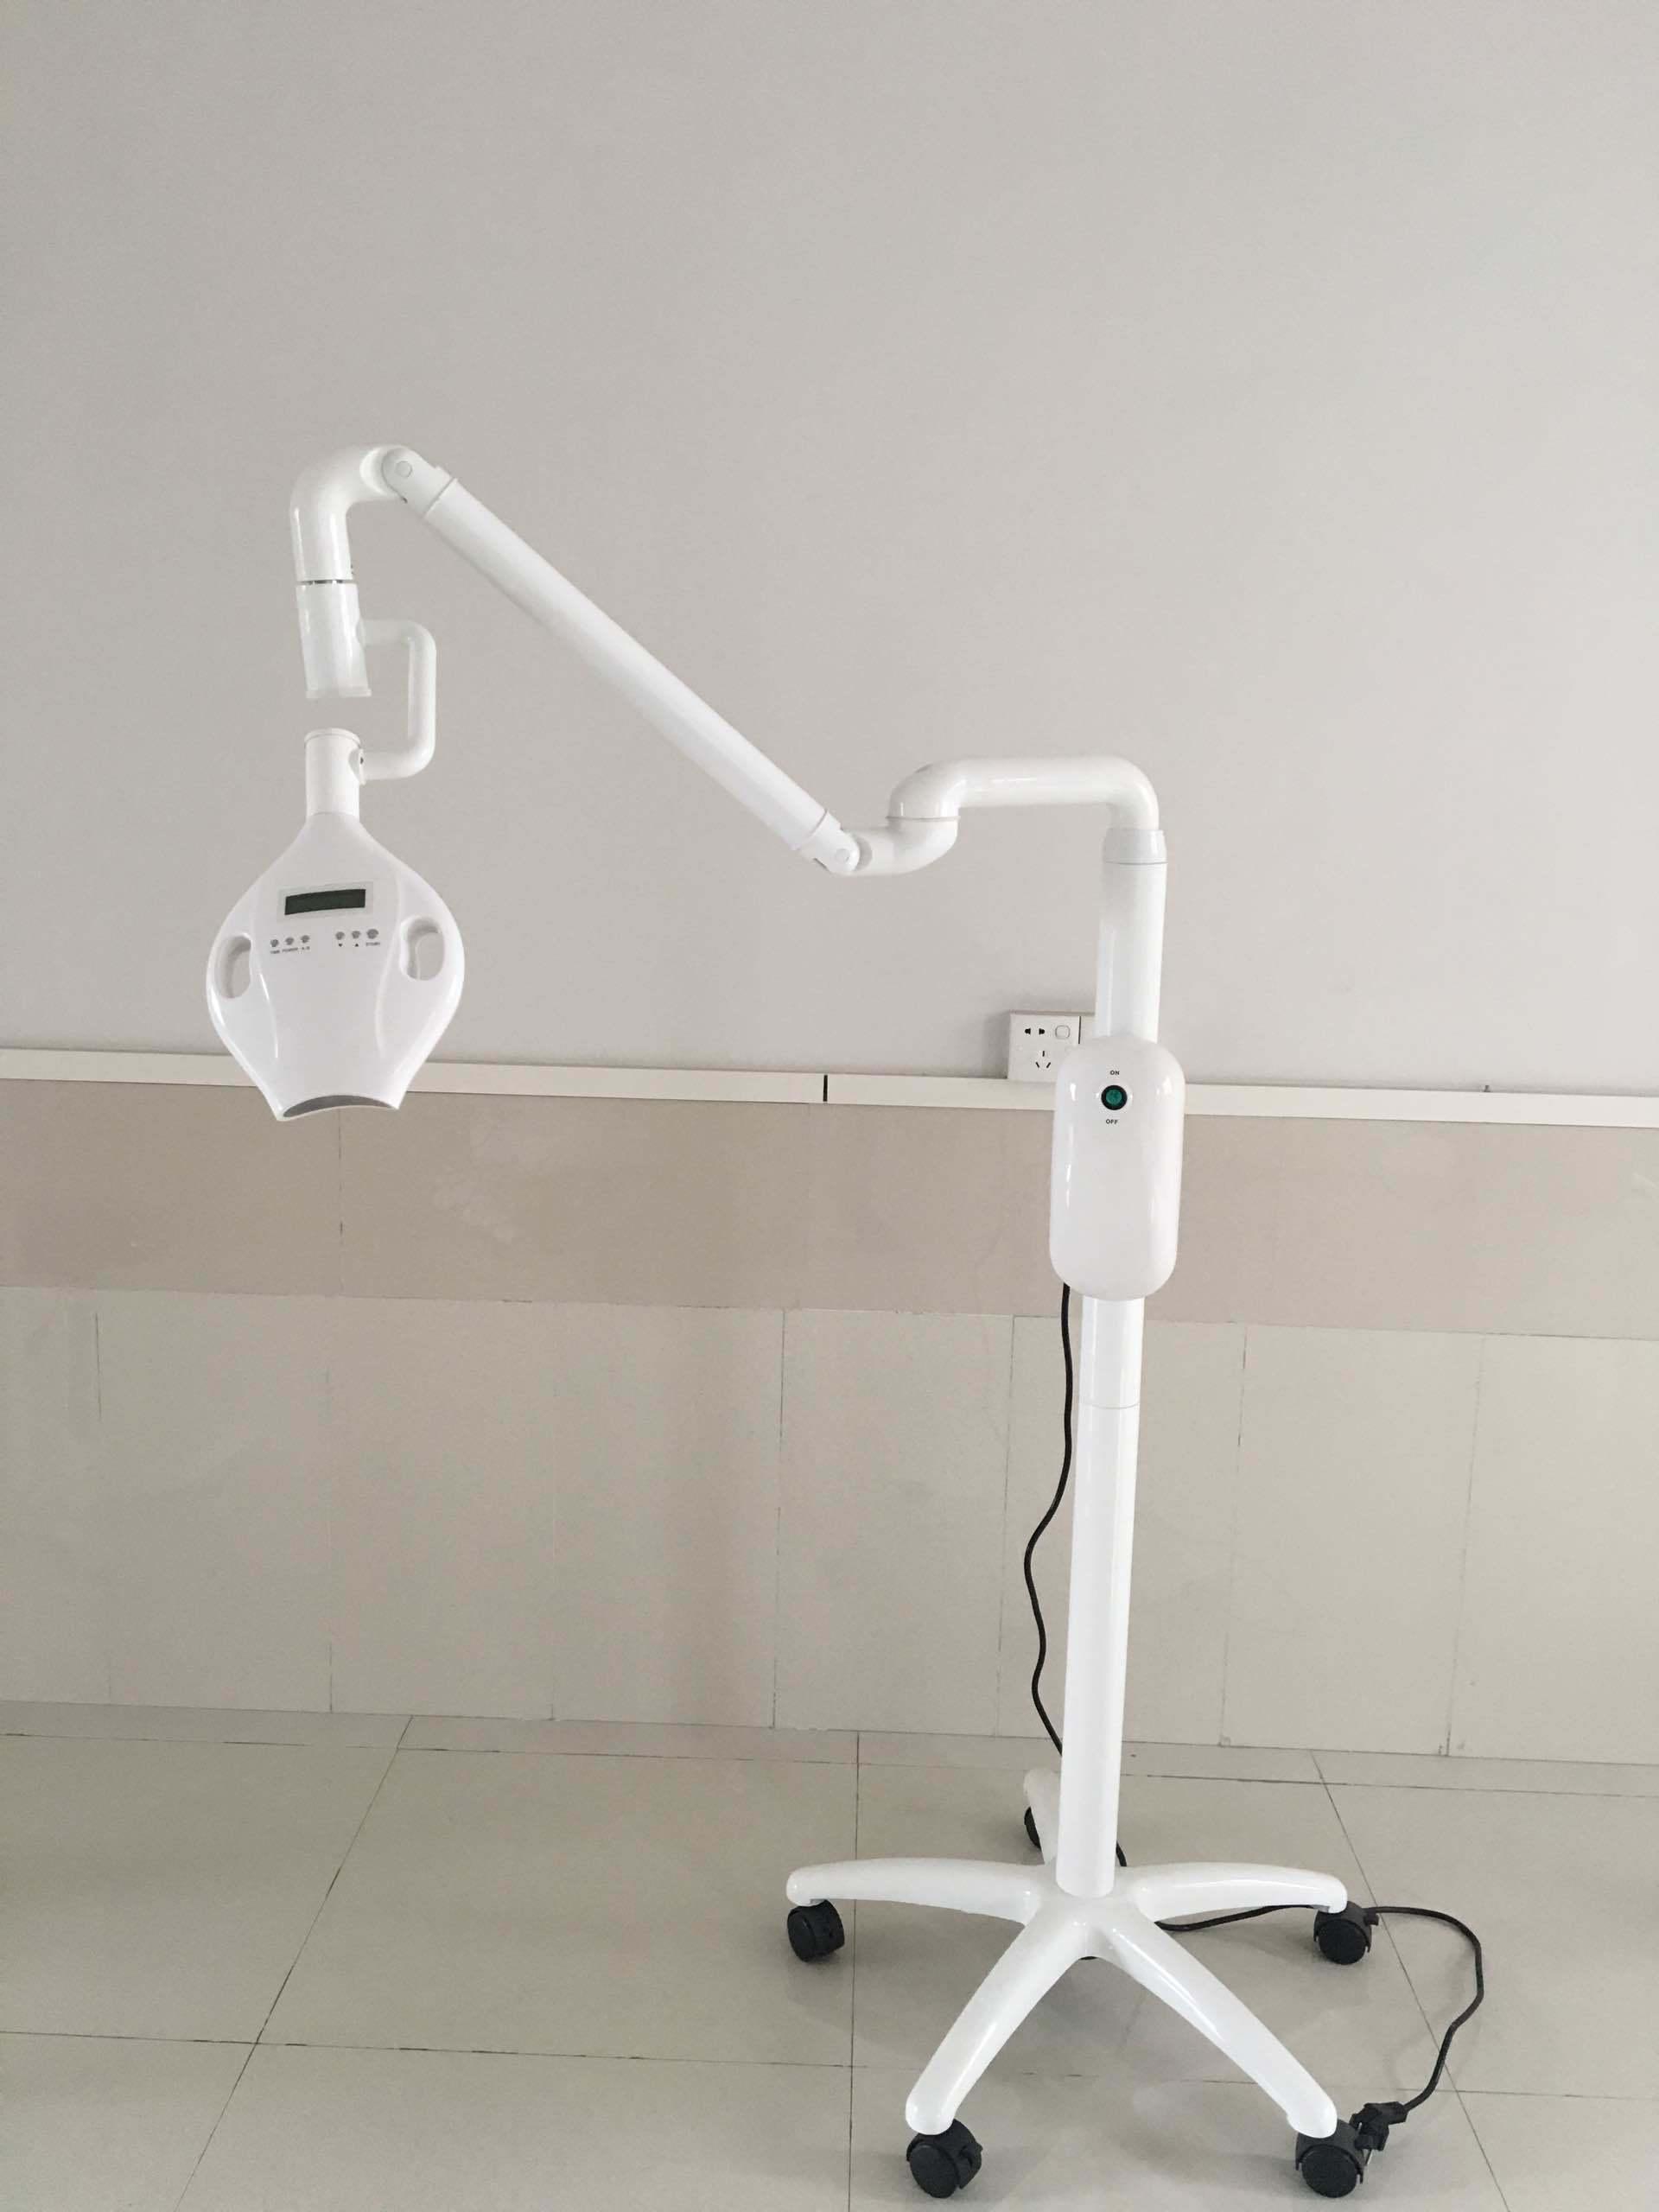 Wholesale Price LED Whitening Machine with 8 Tubes